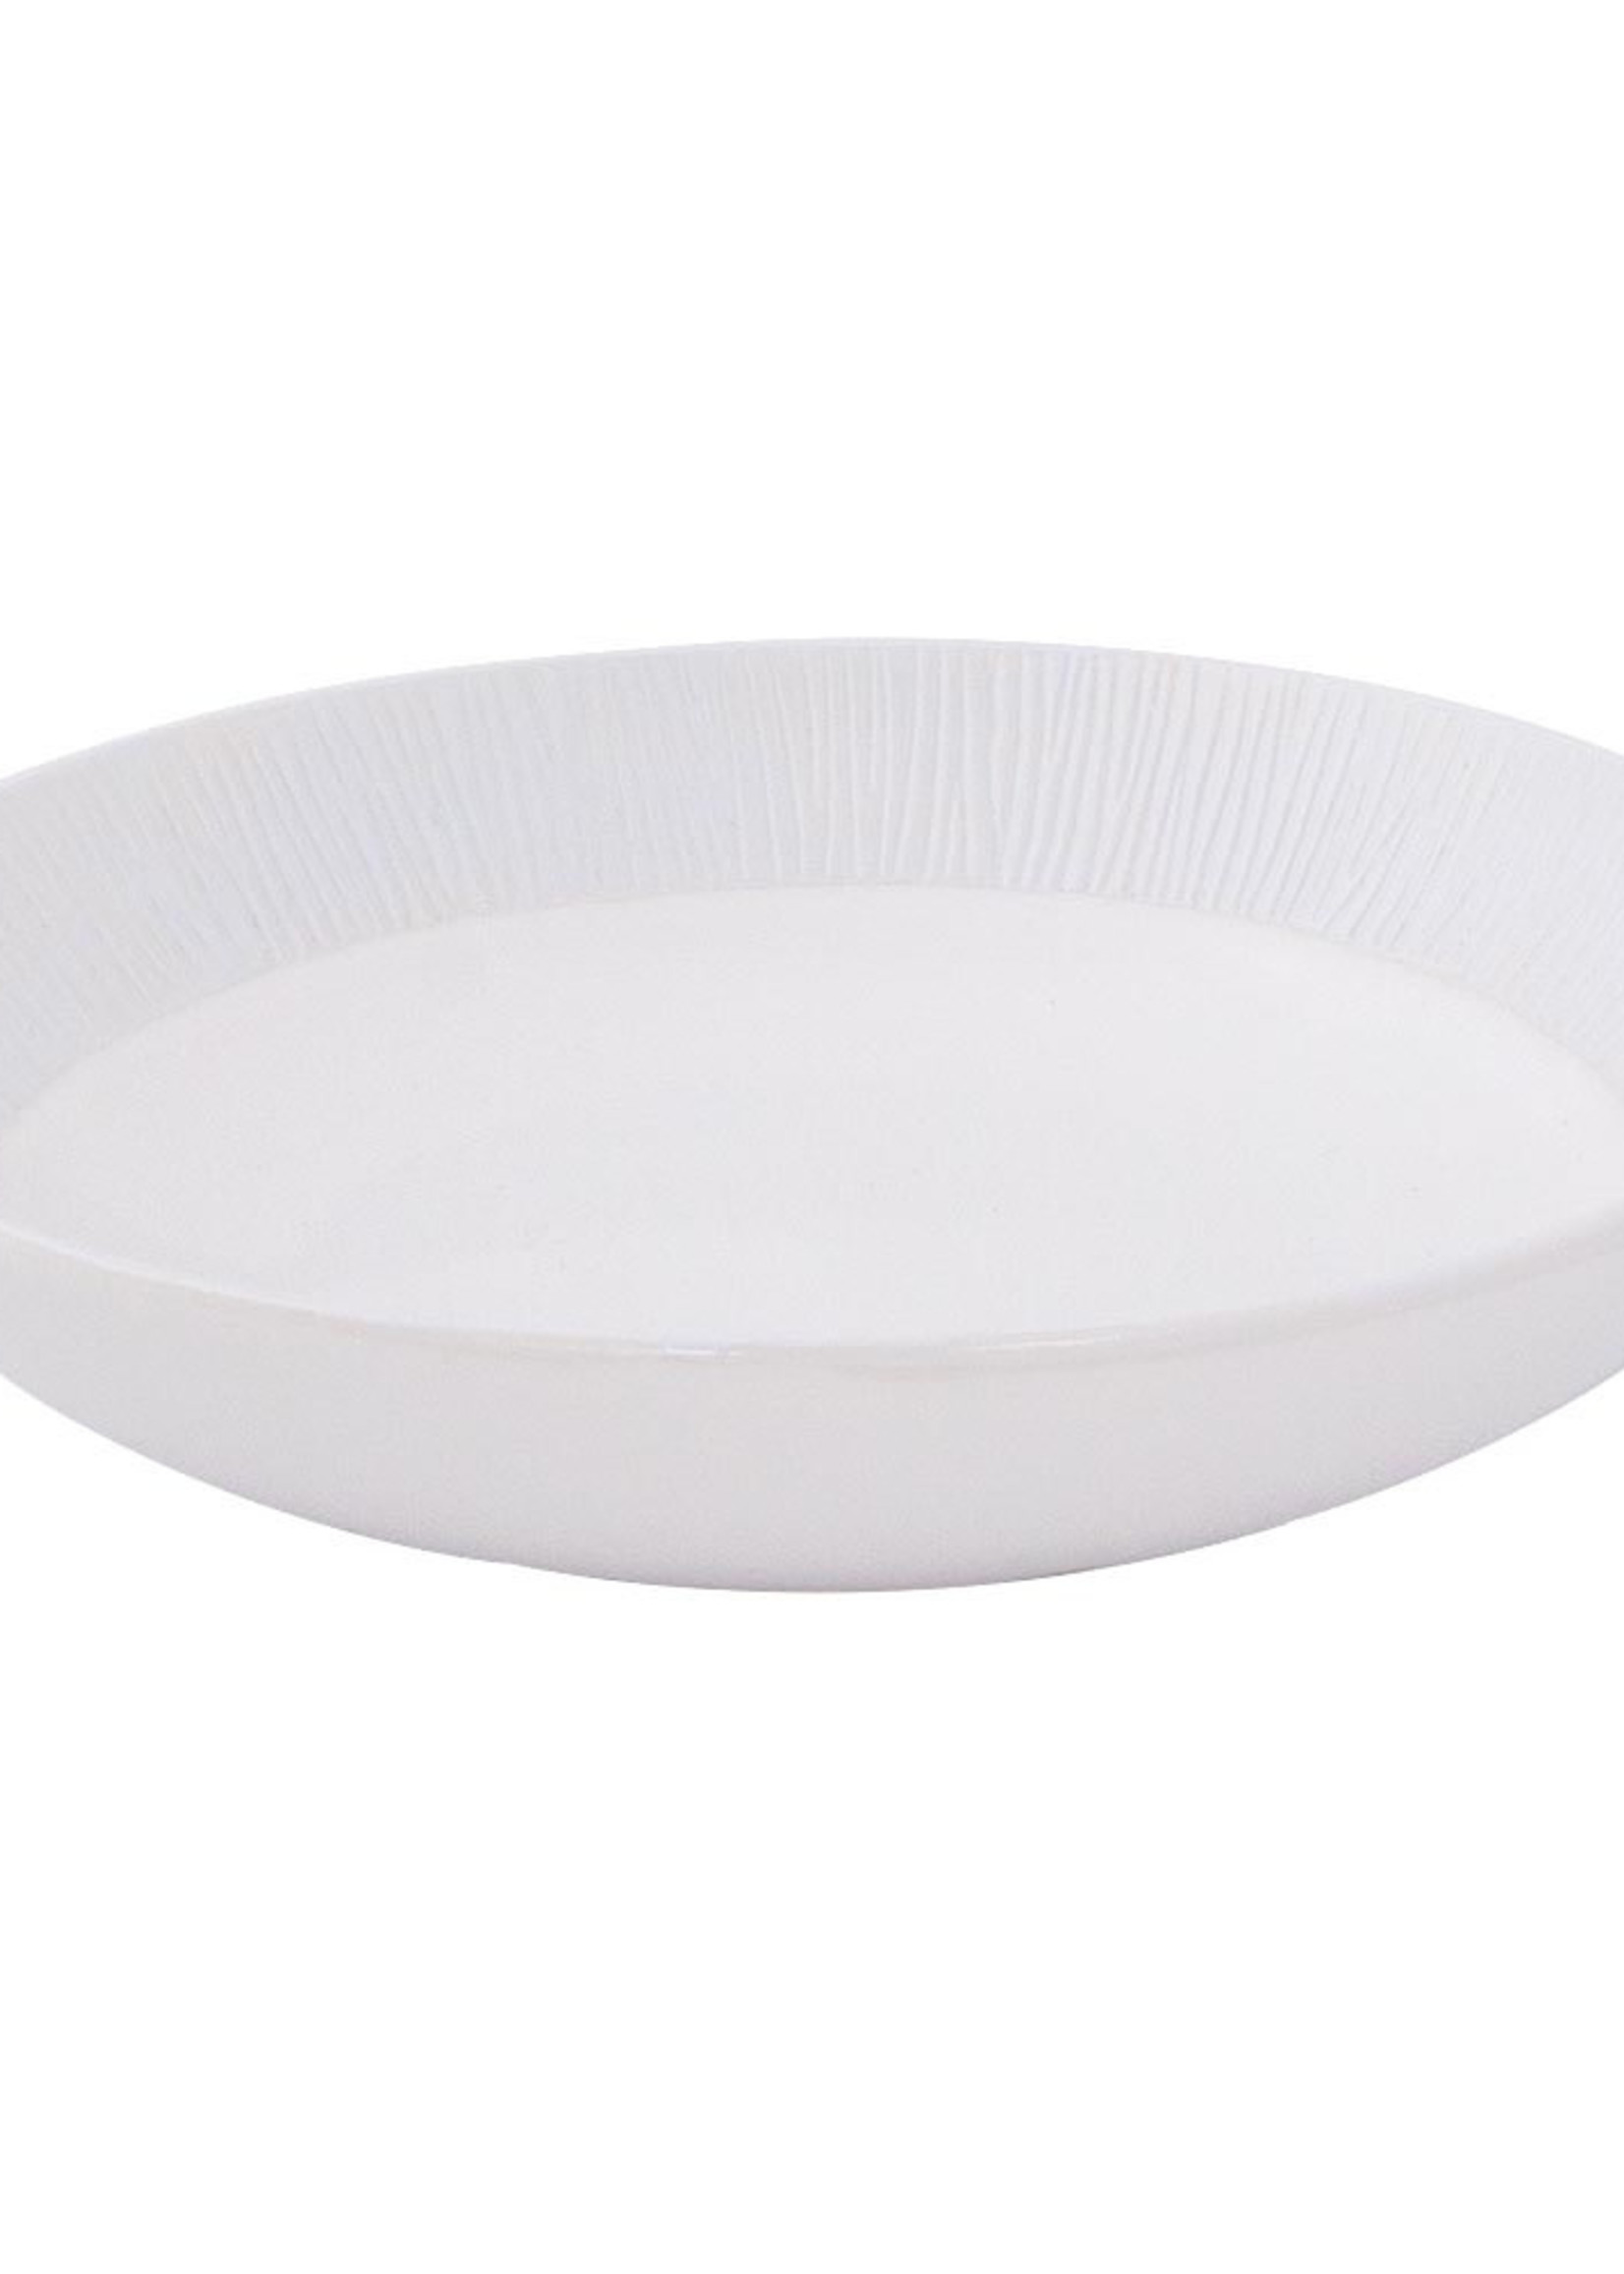 HS Plate Nina pasta / soepbord